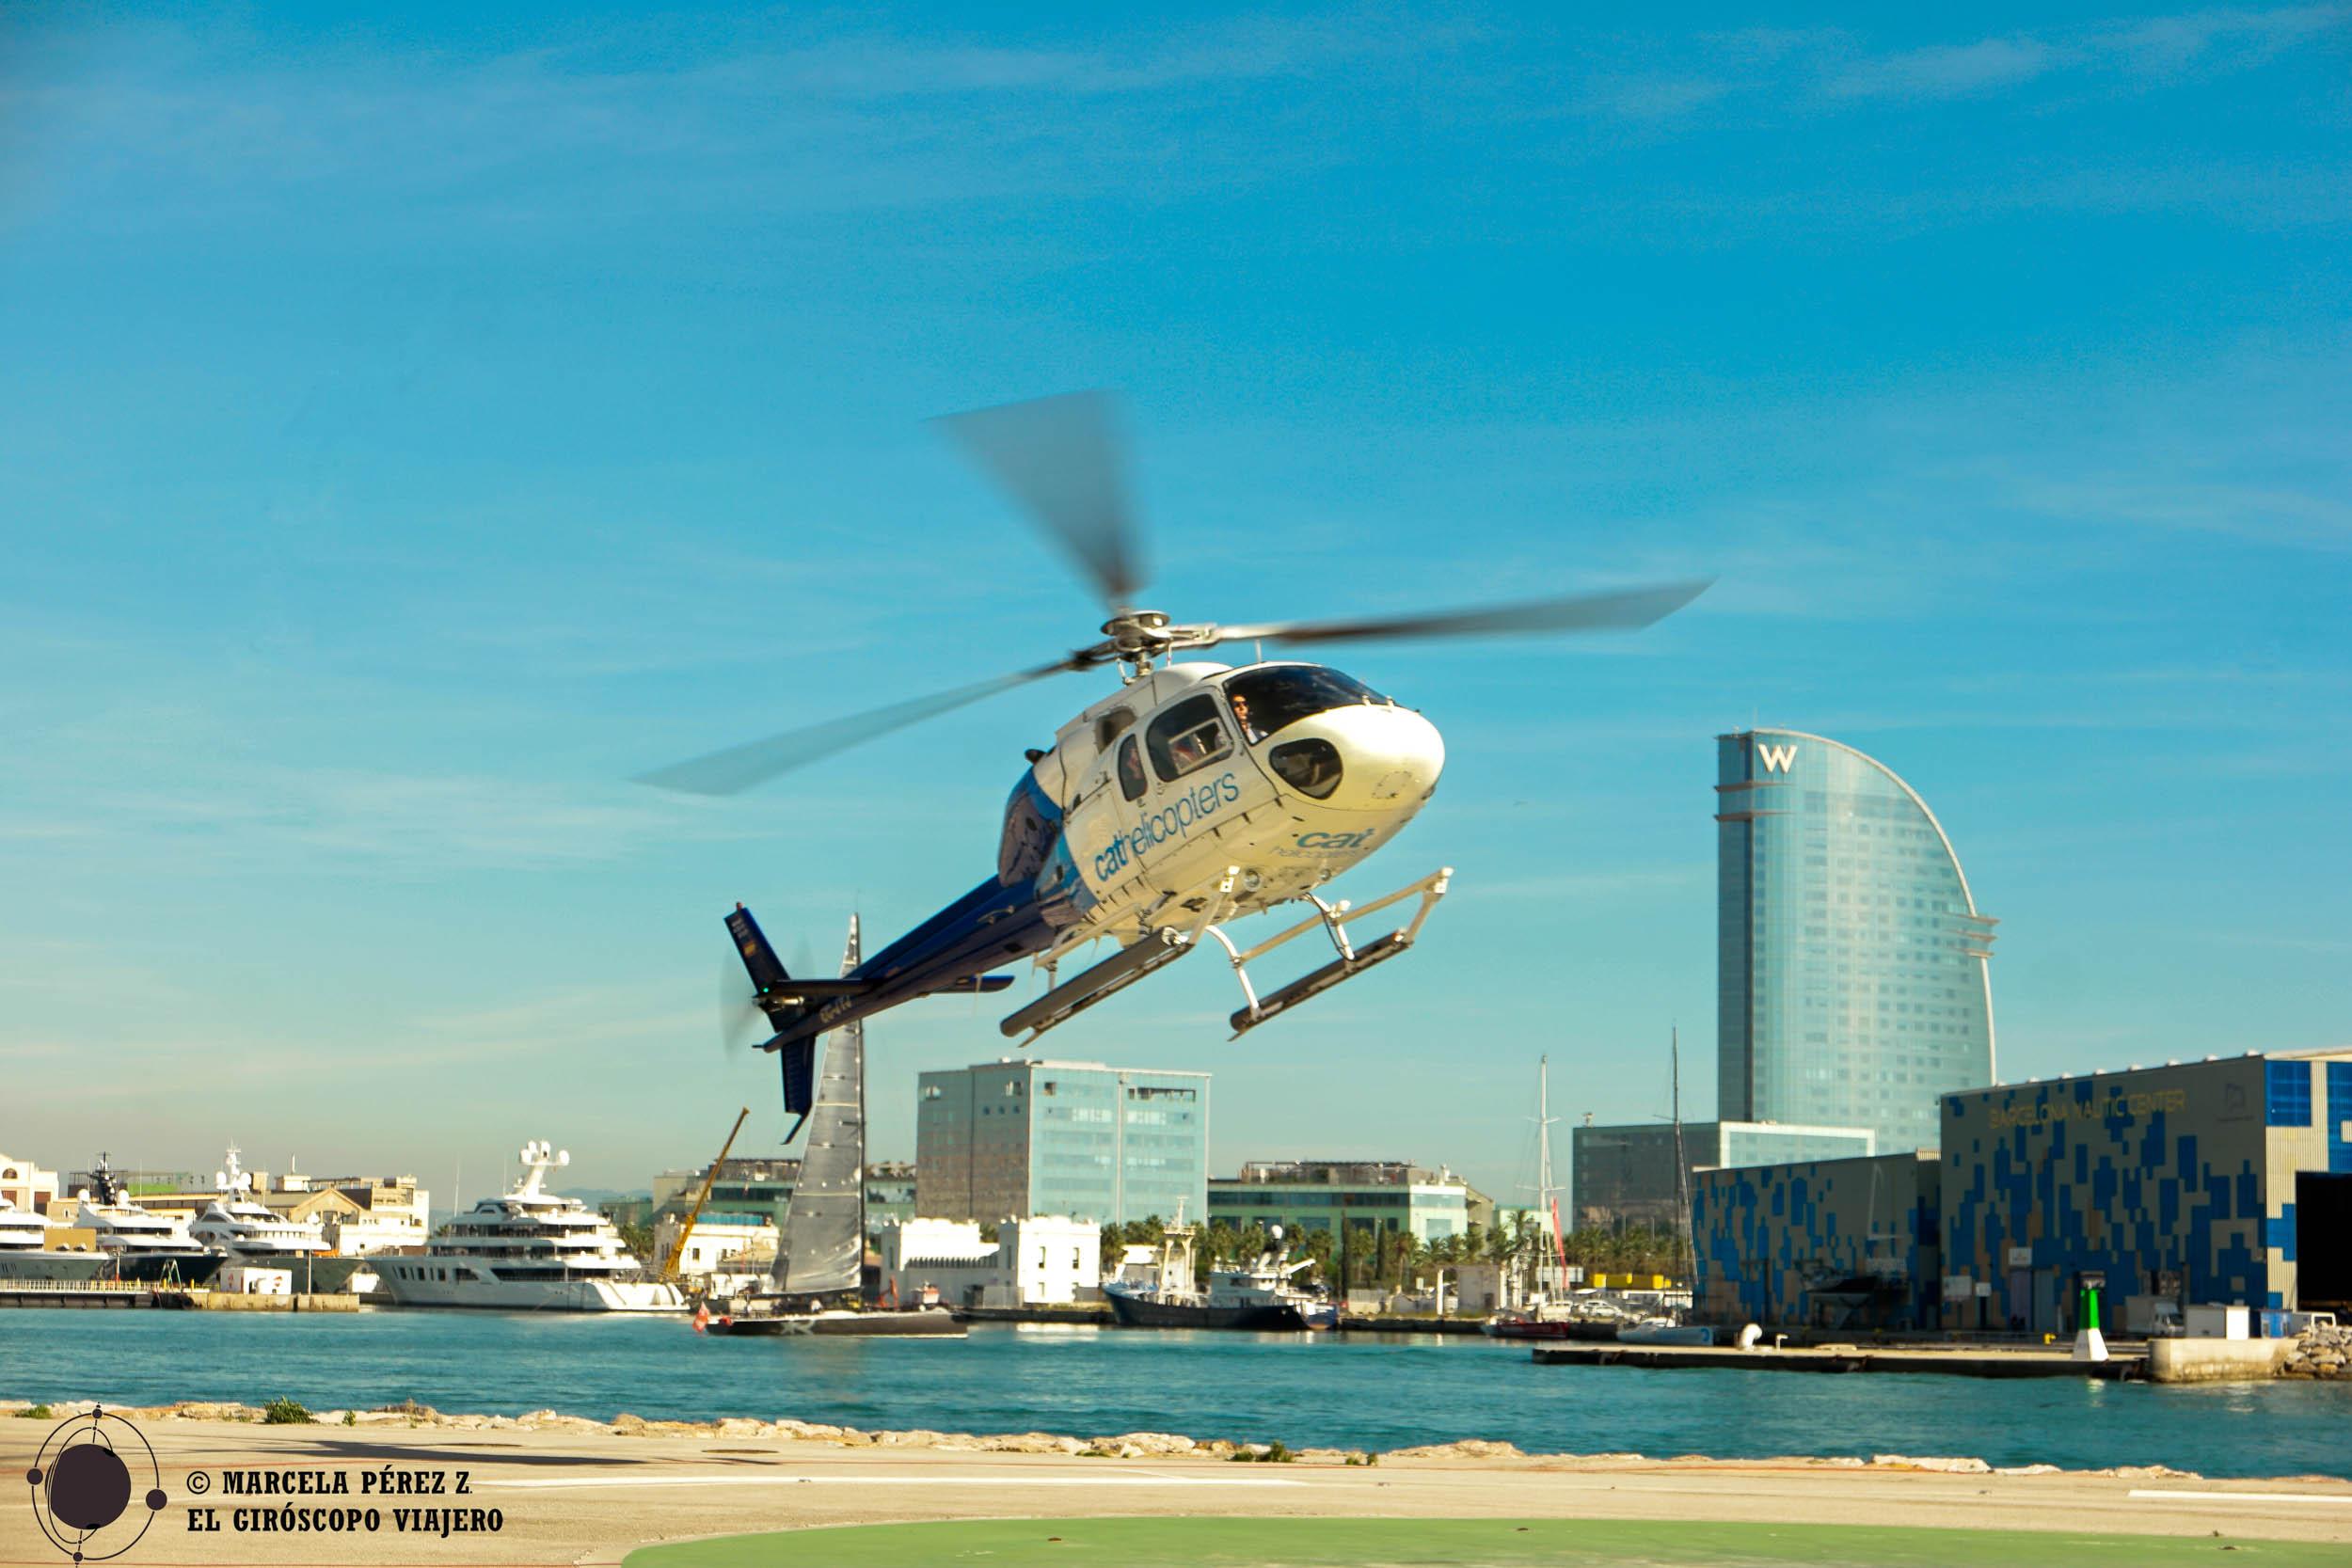 Helicóptero aterrizando